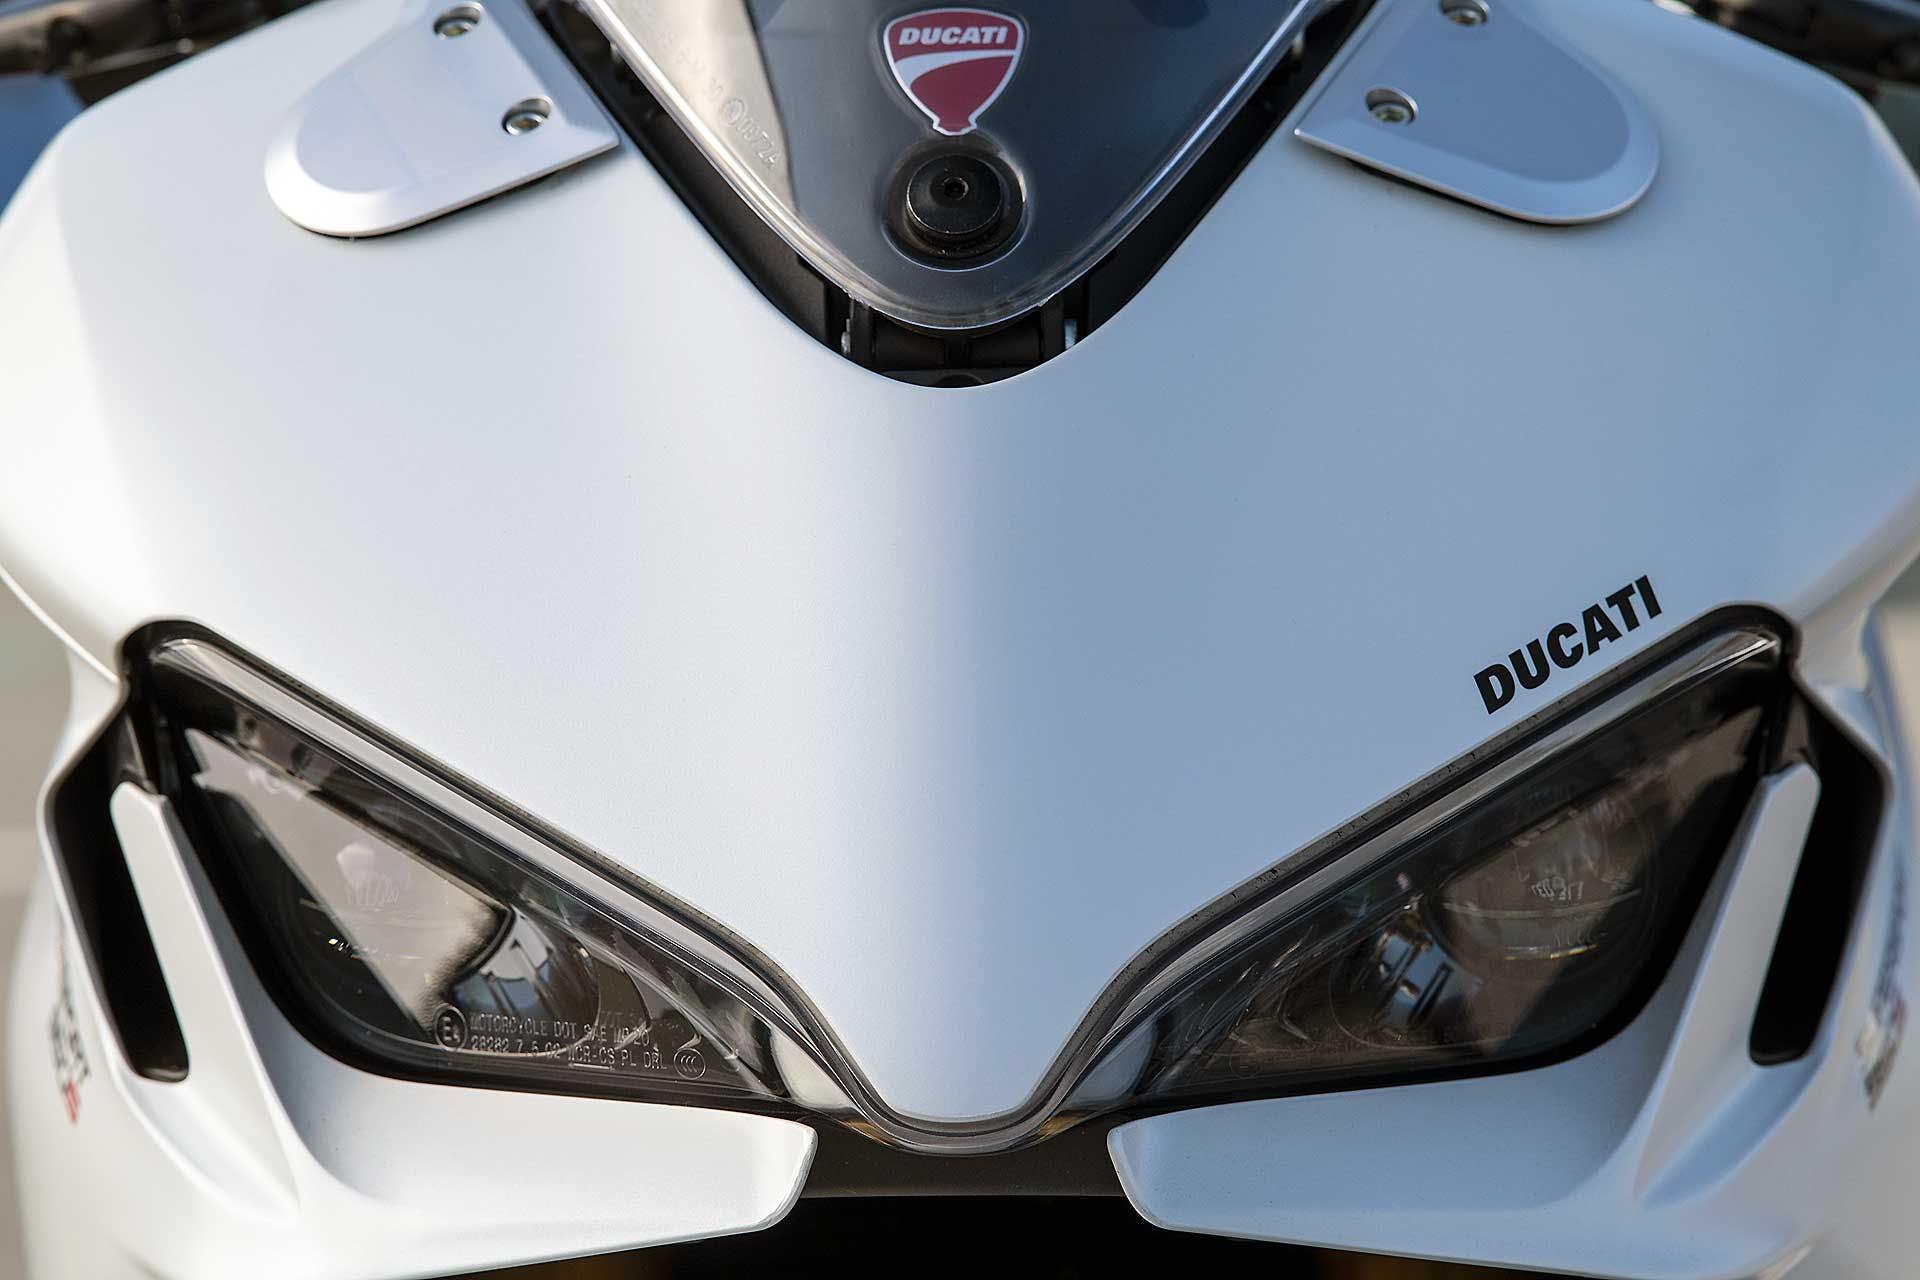 Ducati Supersport 950 S 2021 Particolare faro anteriore